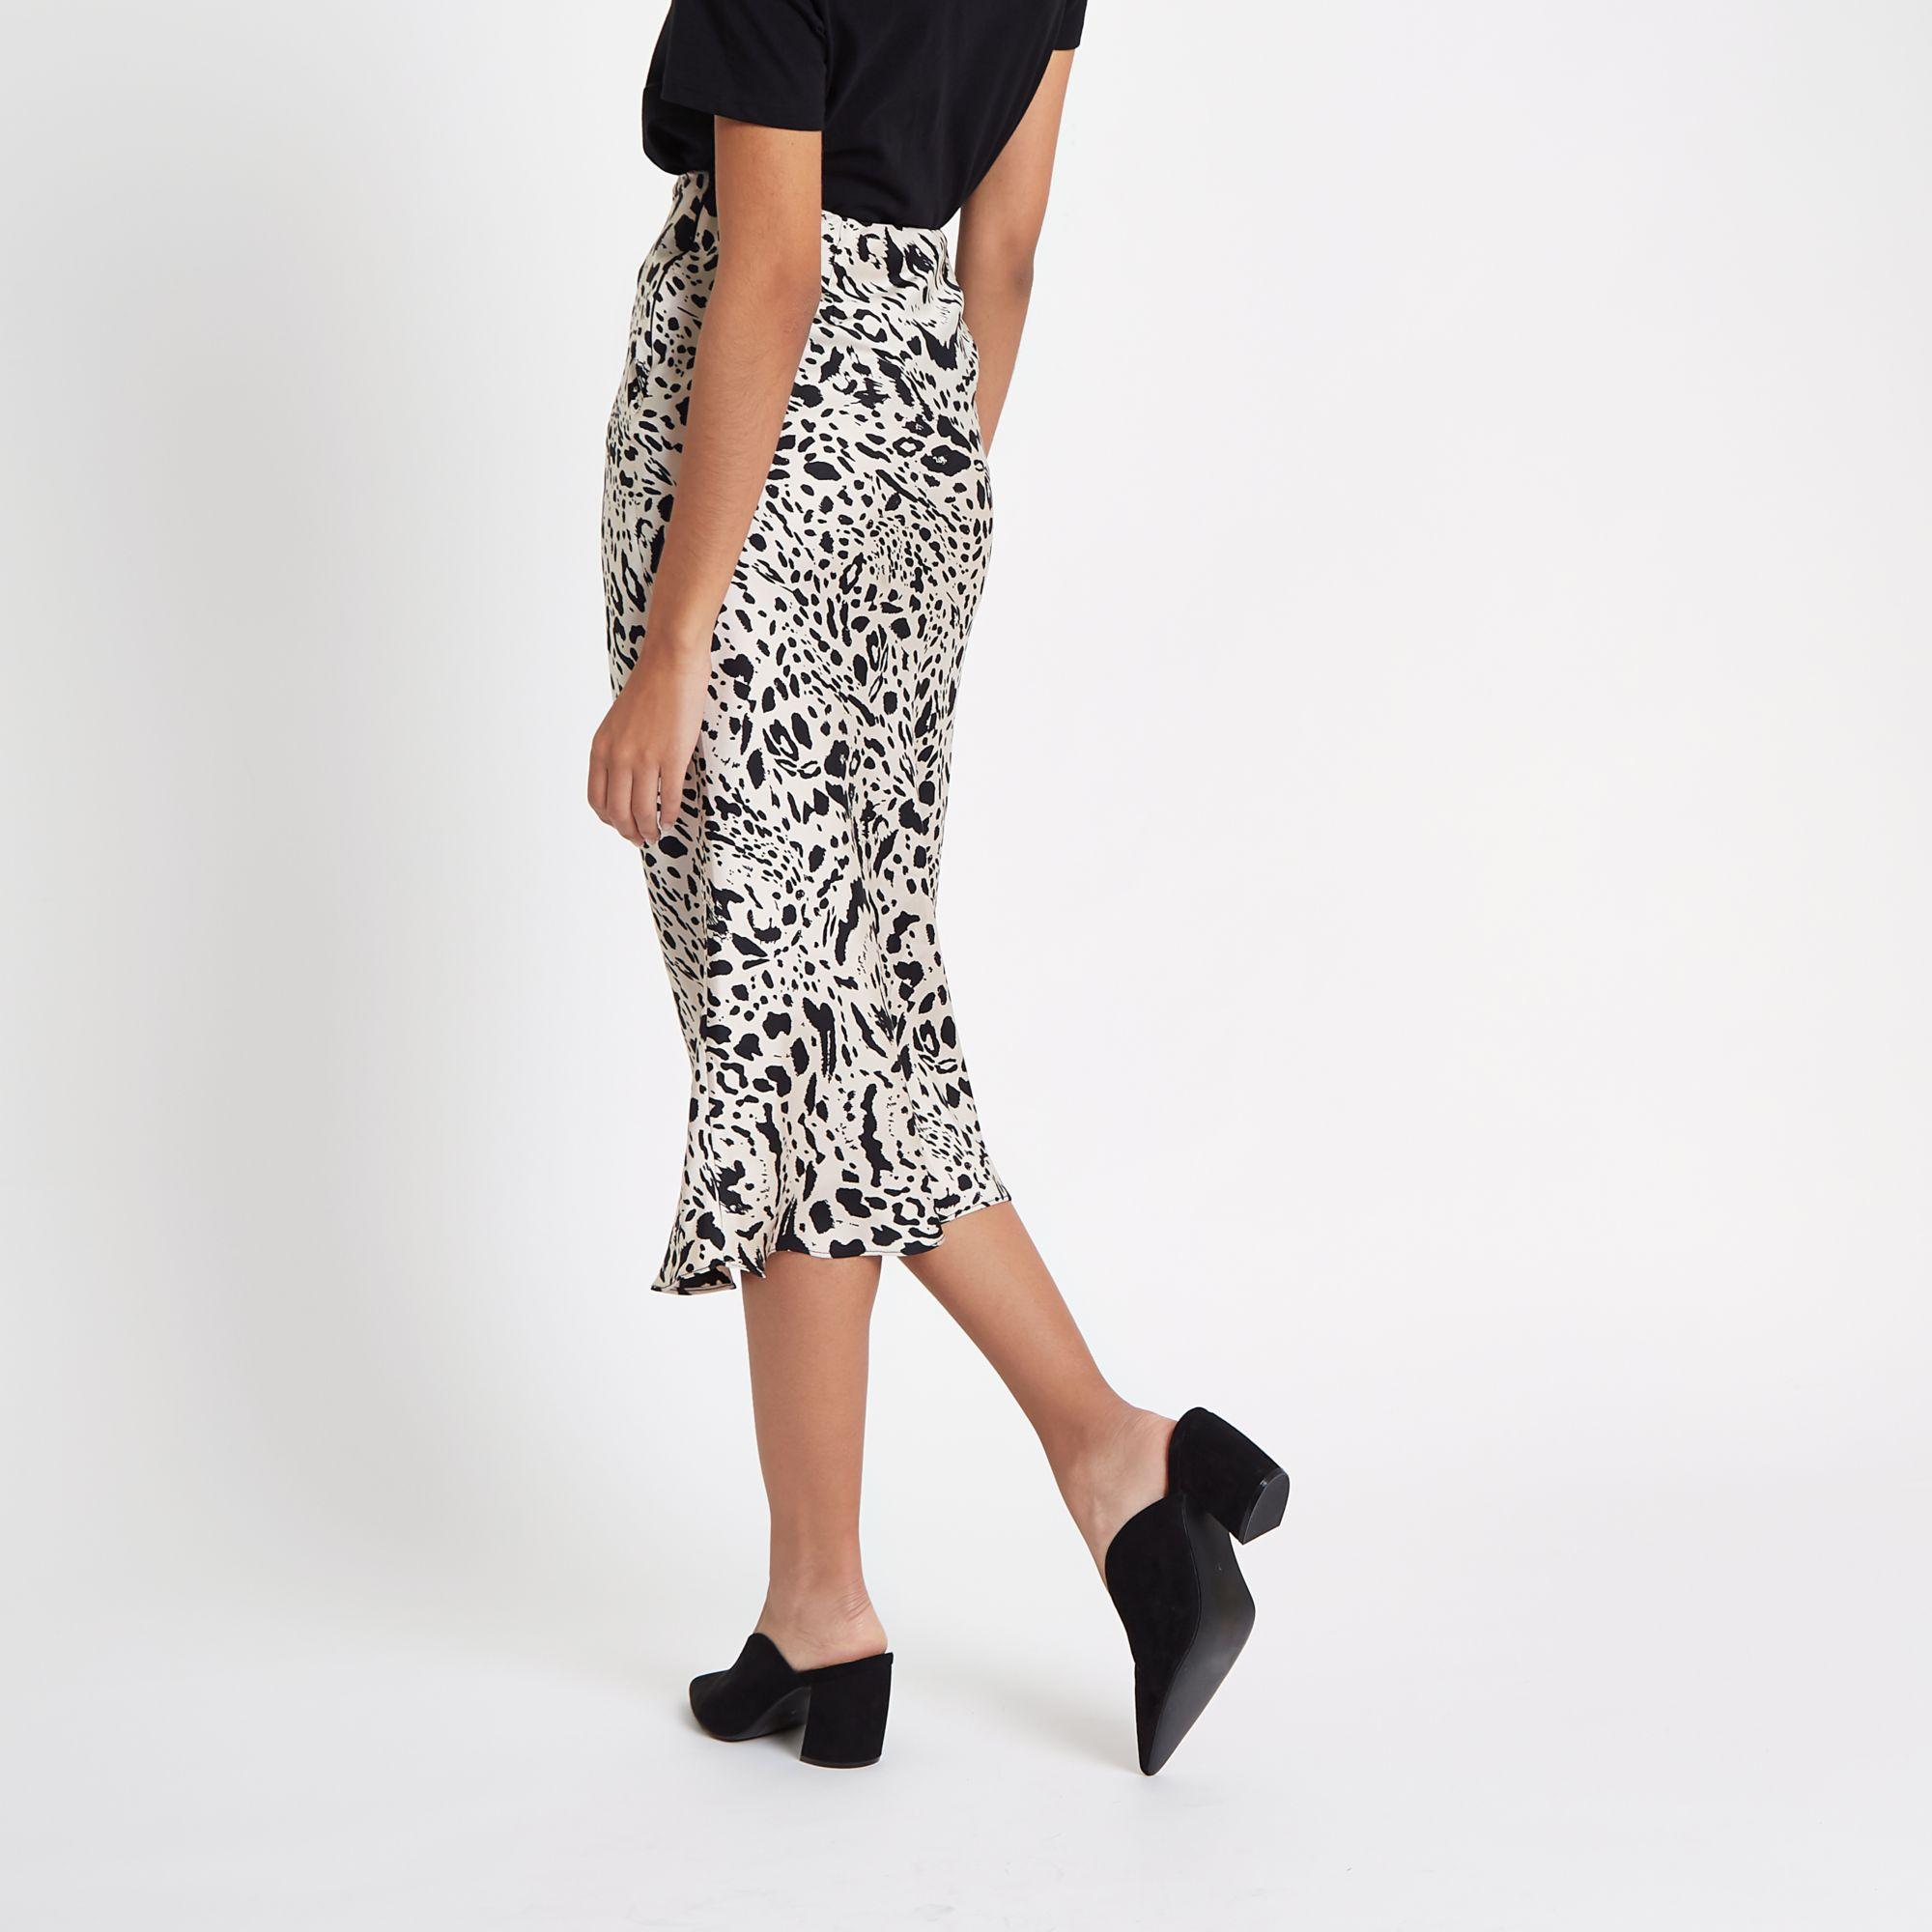 626ad49112 River Island Black leopard print satin midi skirt at £17 | love the ...